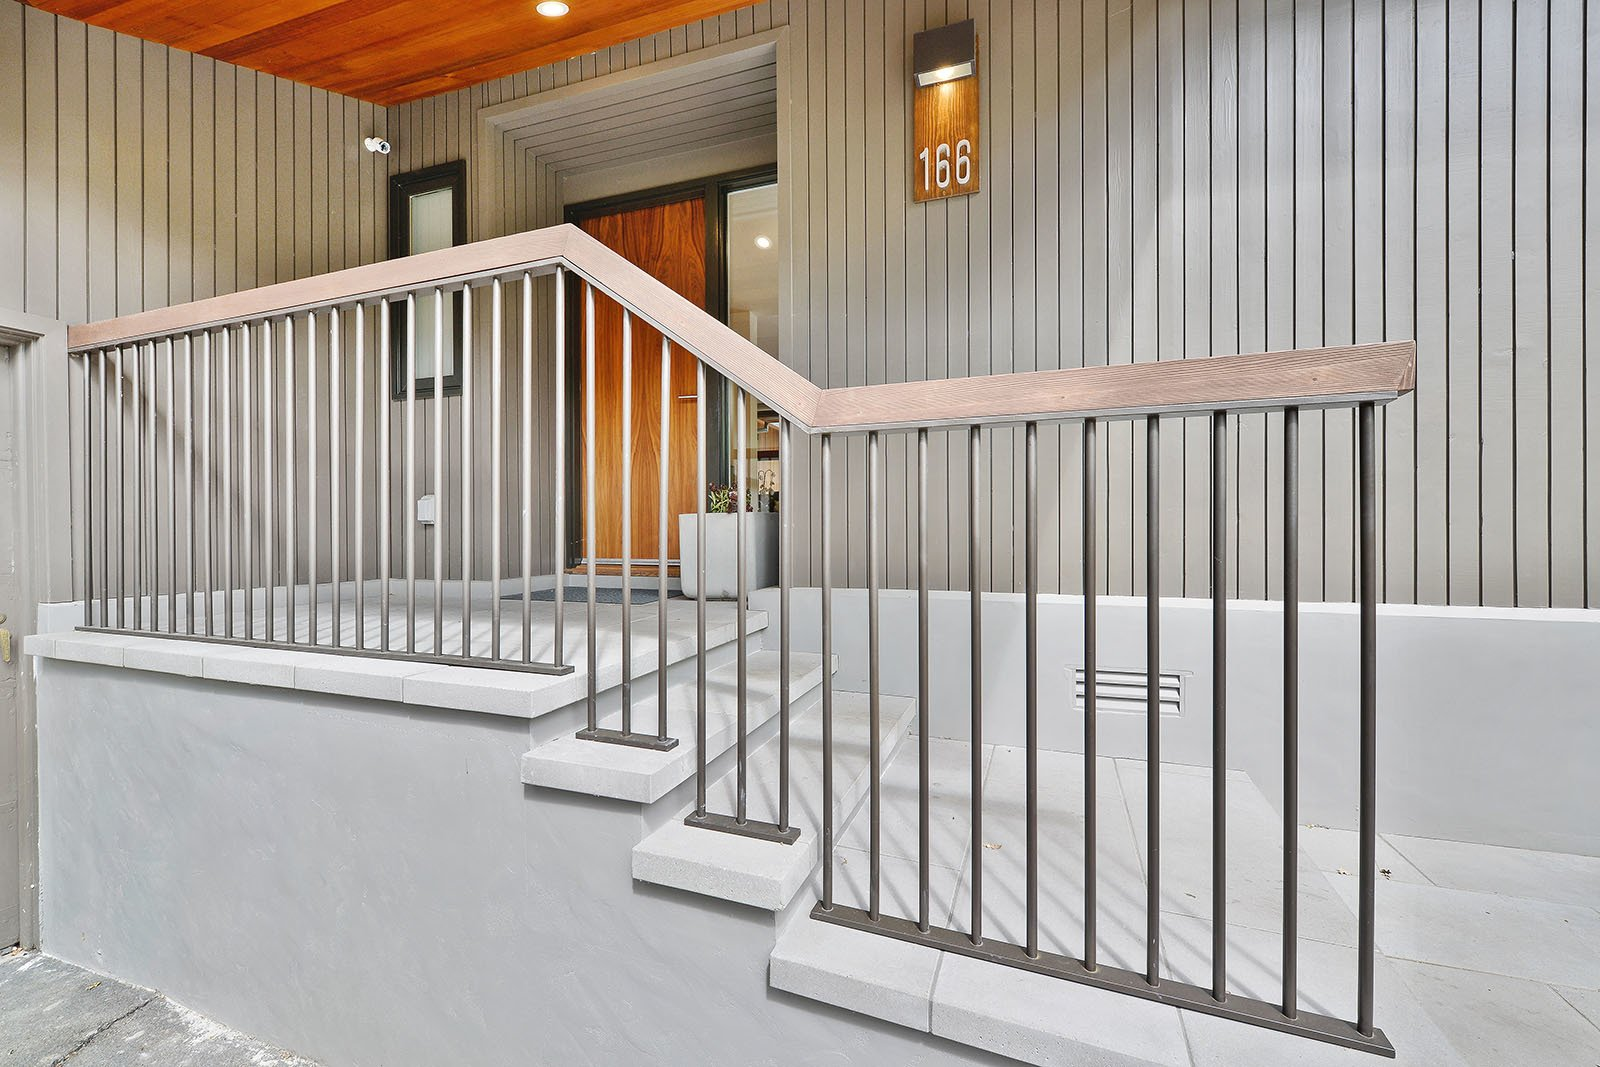 Front steps Tagged: Outdoor, Small Patio, Porch, Deck, Tile Patio, Porch, Deck, Front Yard, and Pavers Patio, Porch, Deck.  Portola Valley by patrick perez/designpad architecture